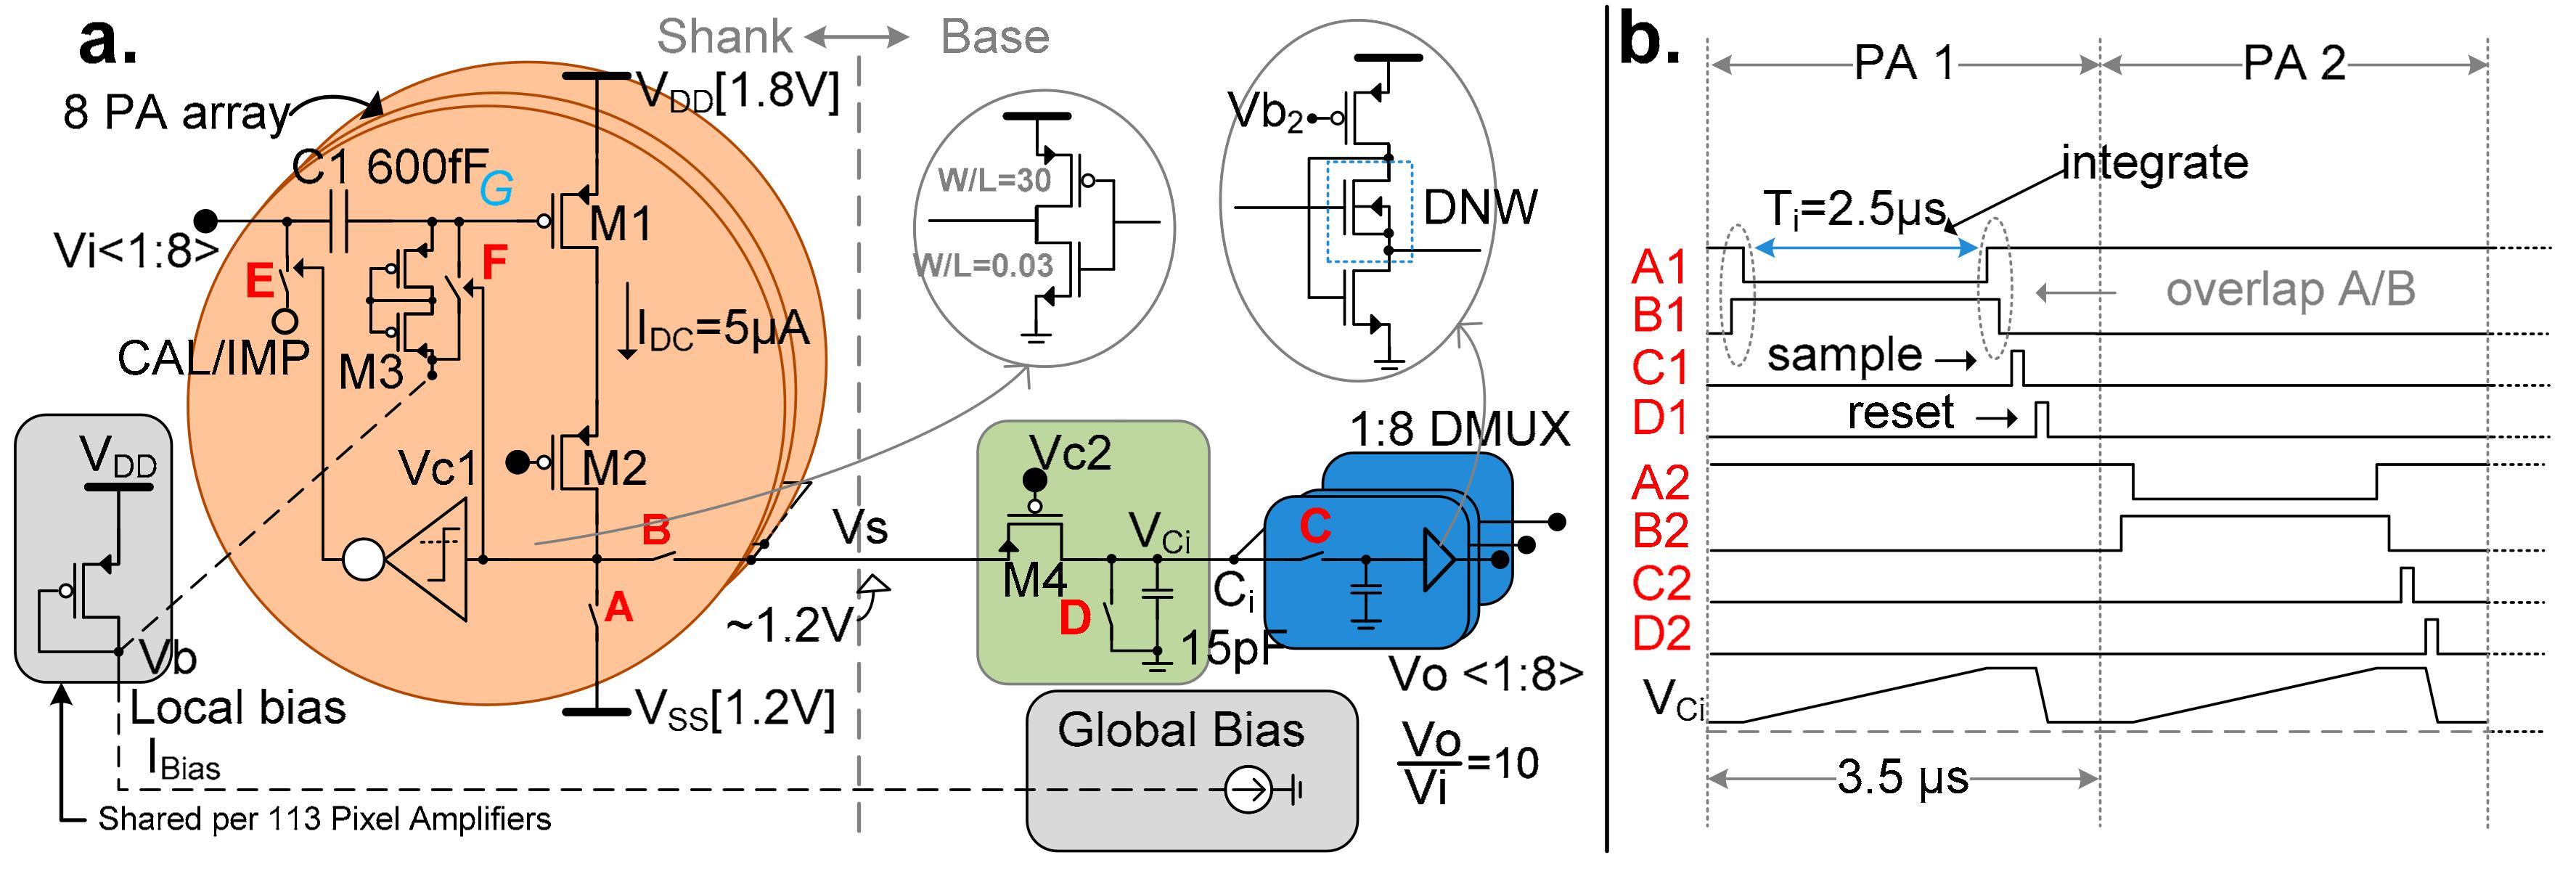 Assembly Diagram Moreover Jvc Car Stereo Wiring Diagram Moreover Jvc